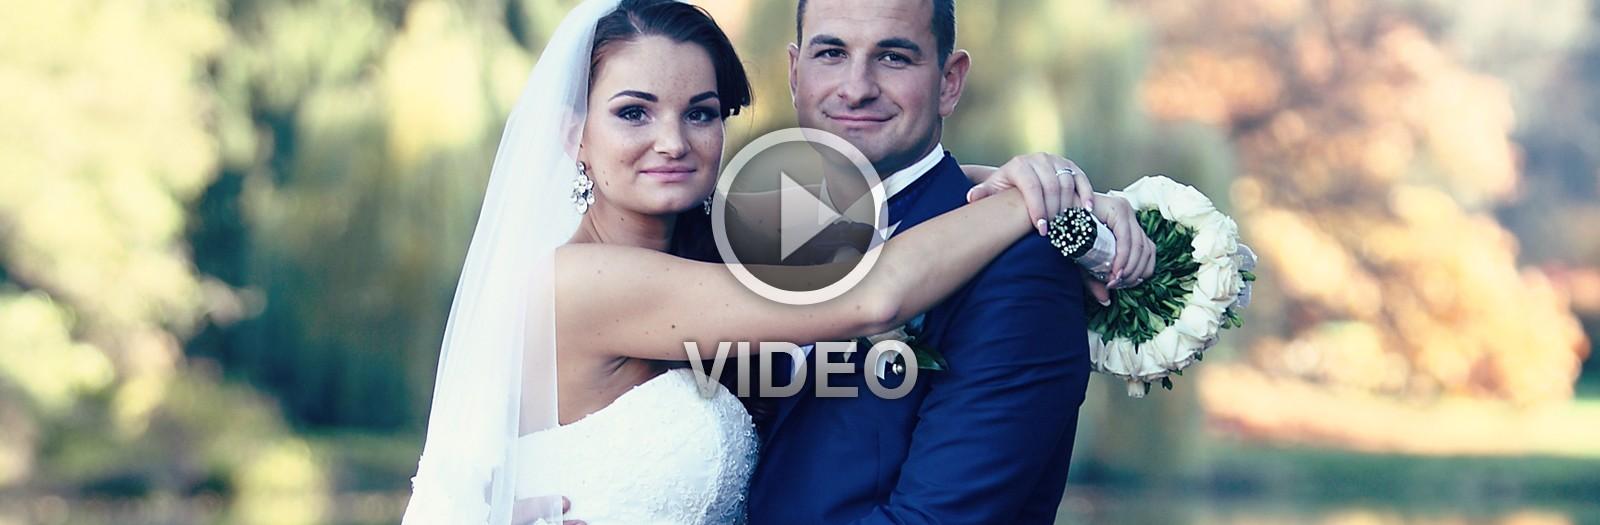 Anička a Josef - 22.10.2013 - video